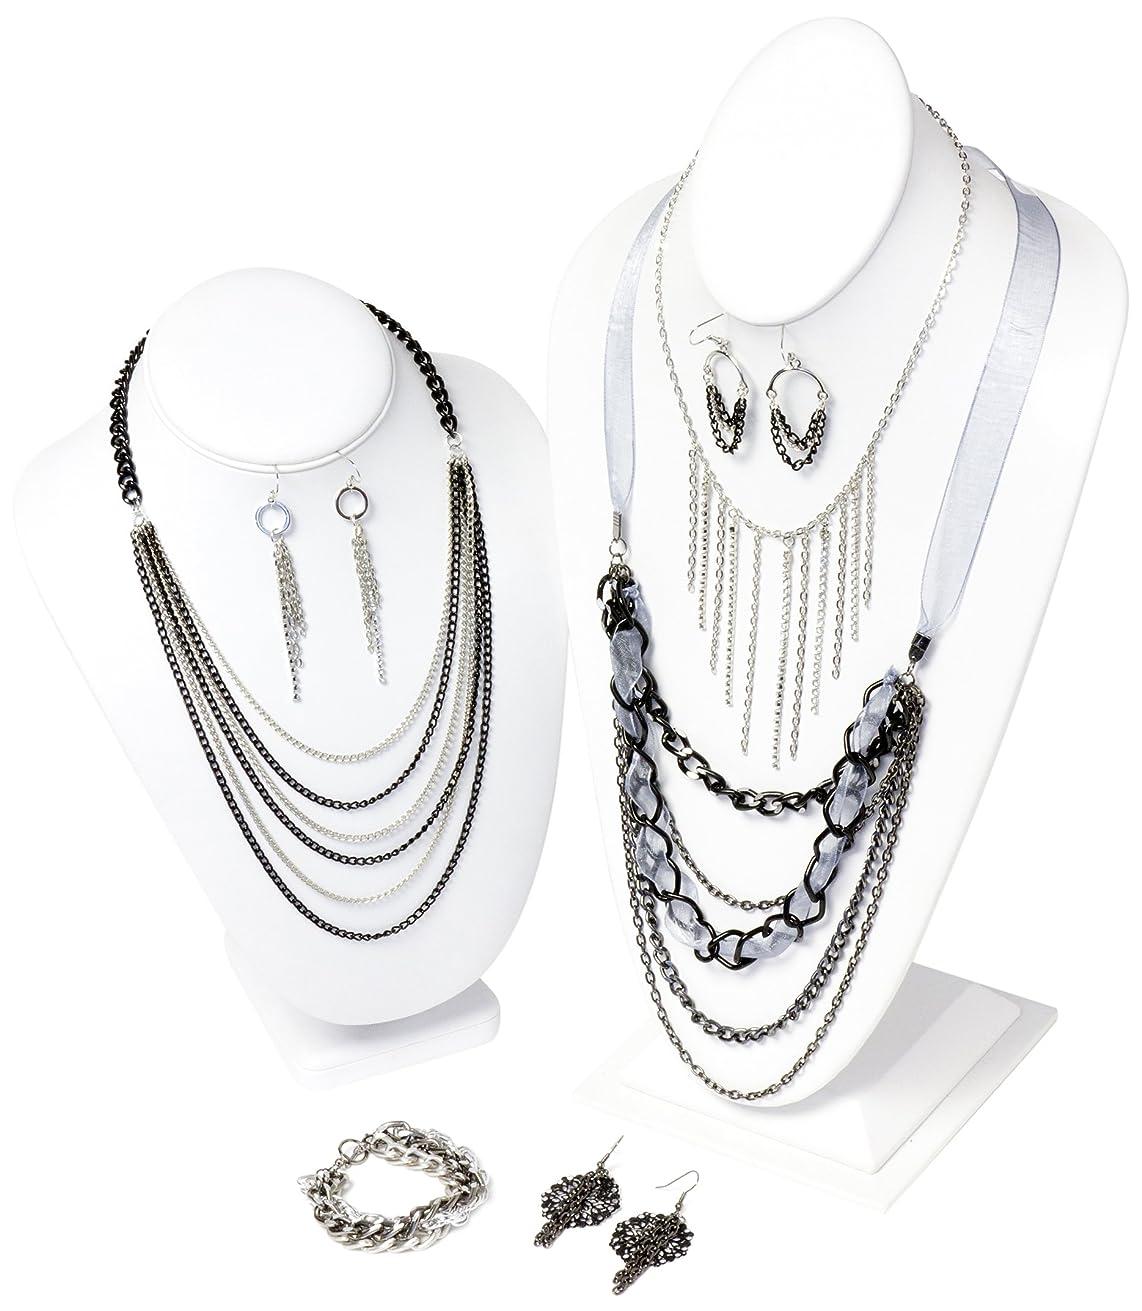 Jewelry Basics Class in A Box Kit, Silver Chain